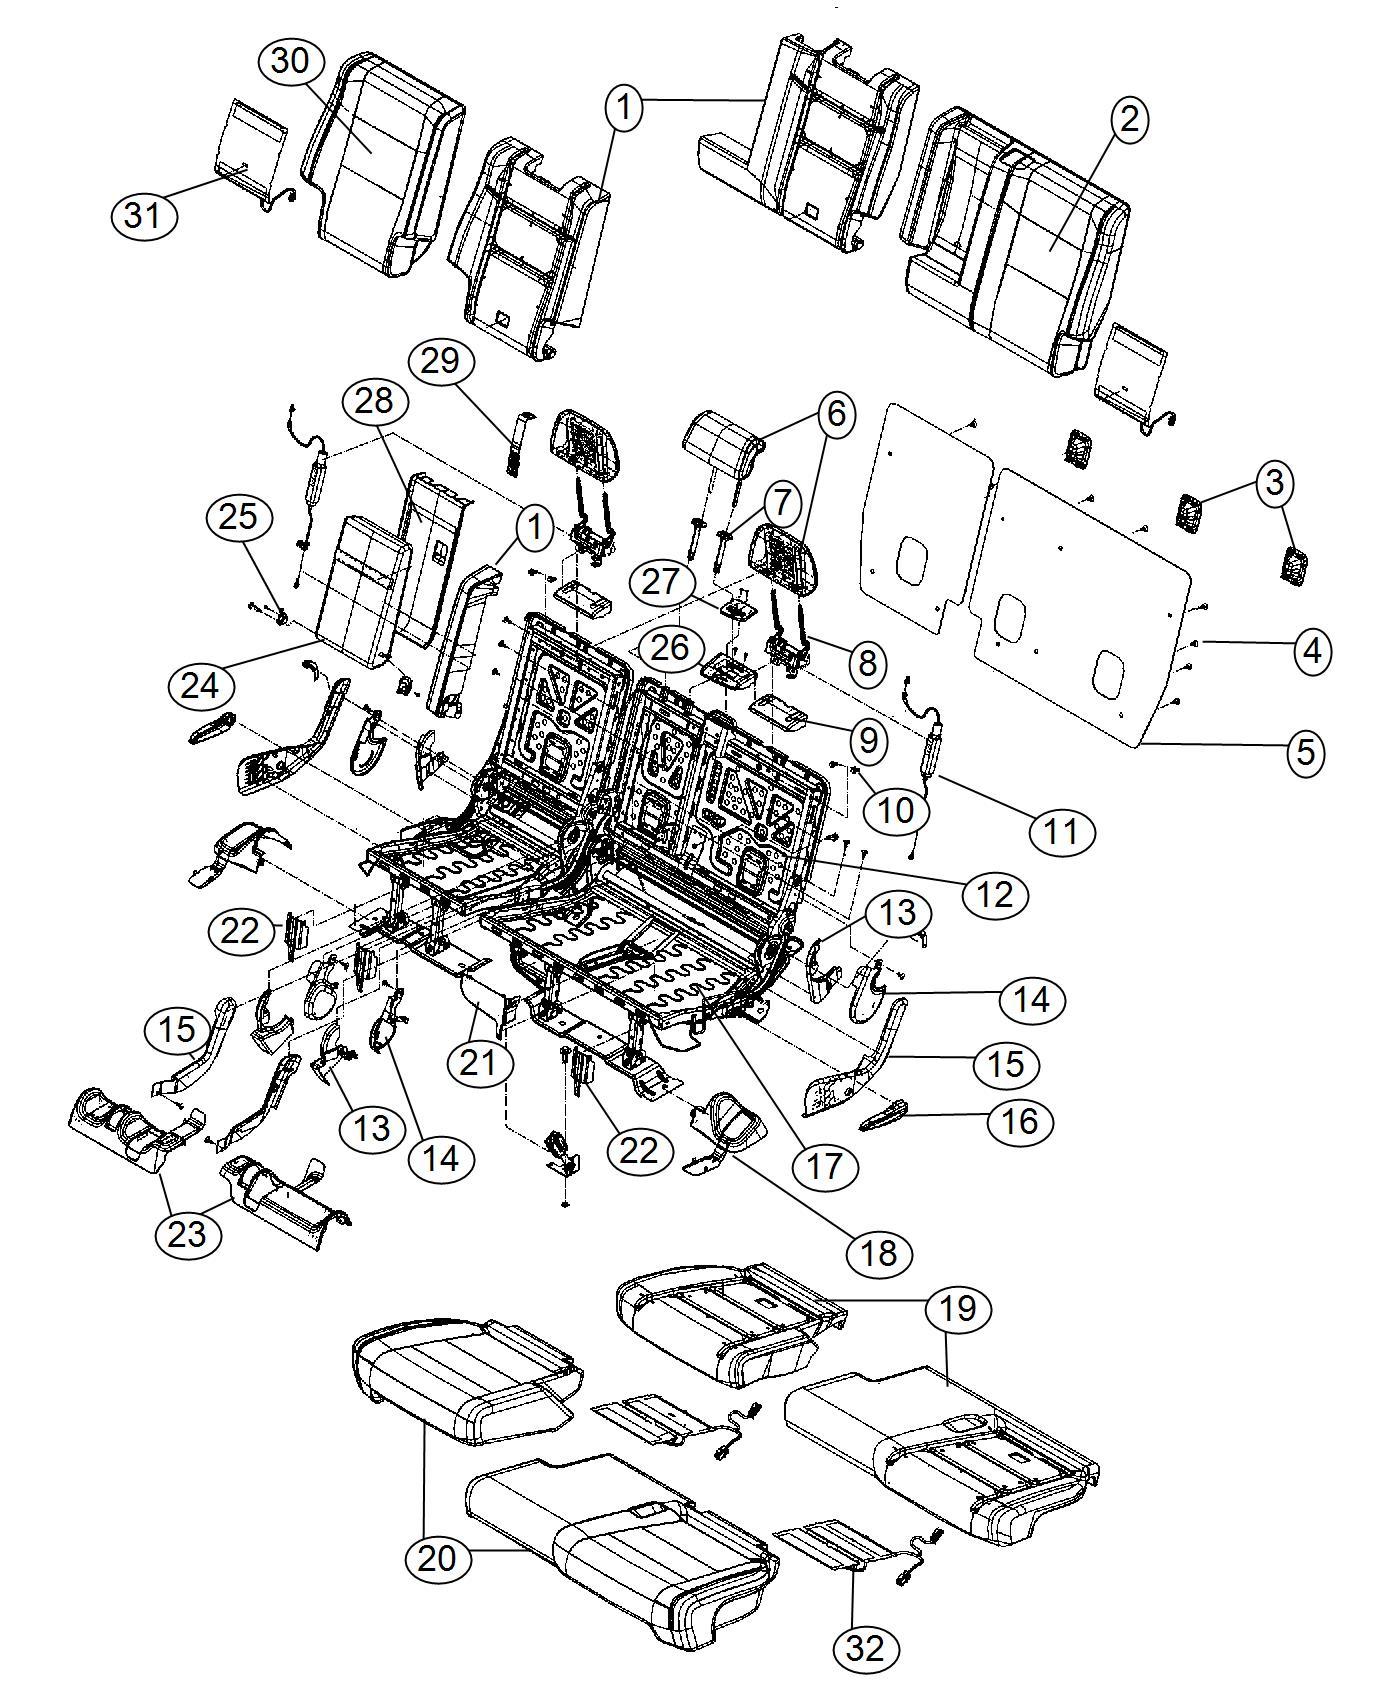 tags: #jeep cherokee suspension parts#jeep cherokee engine parts#jeep grand  cherokee parts diagram#jeep grand cherokee body parts#2004 jeep grand  cherokee